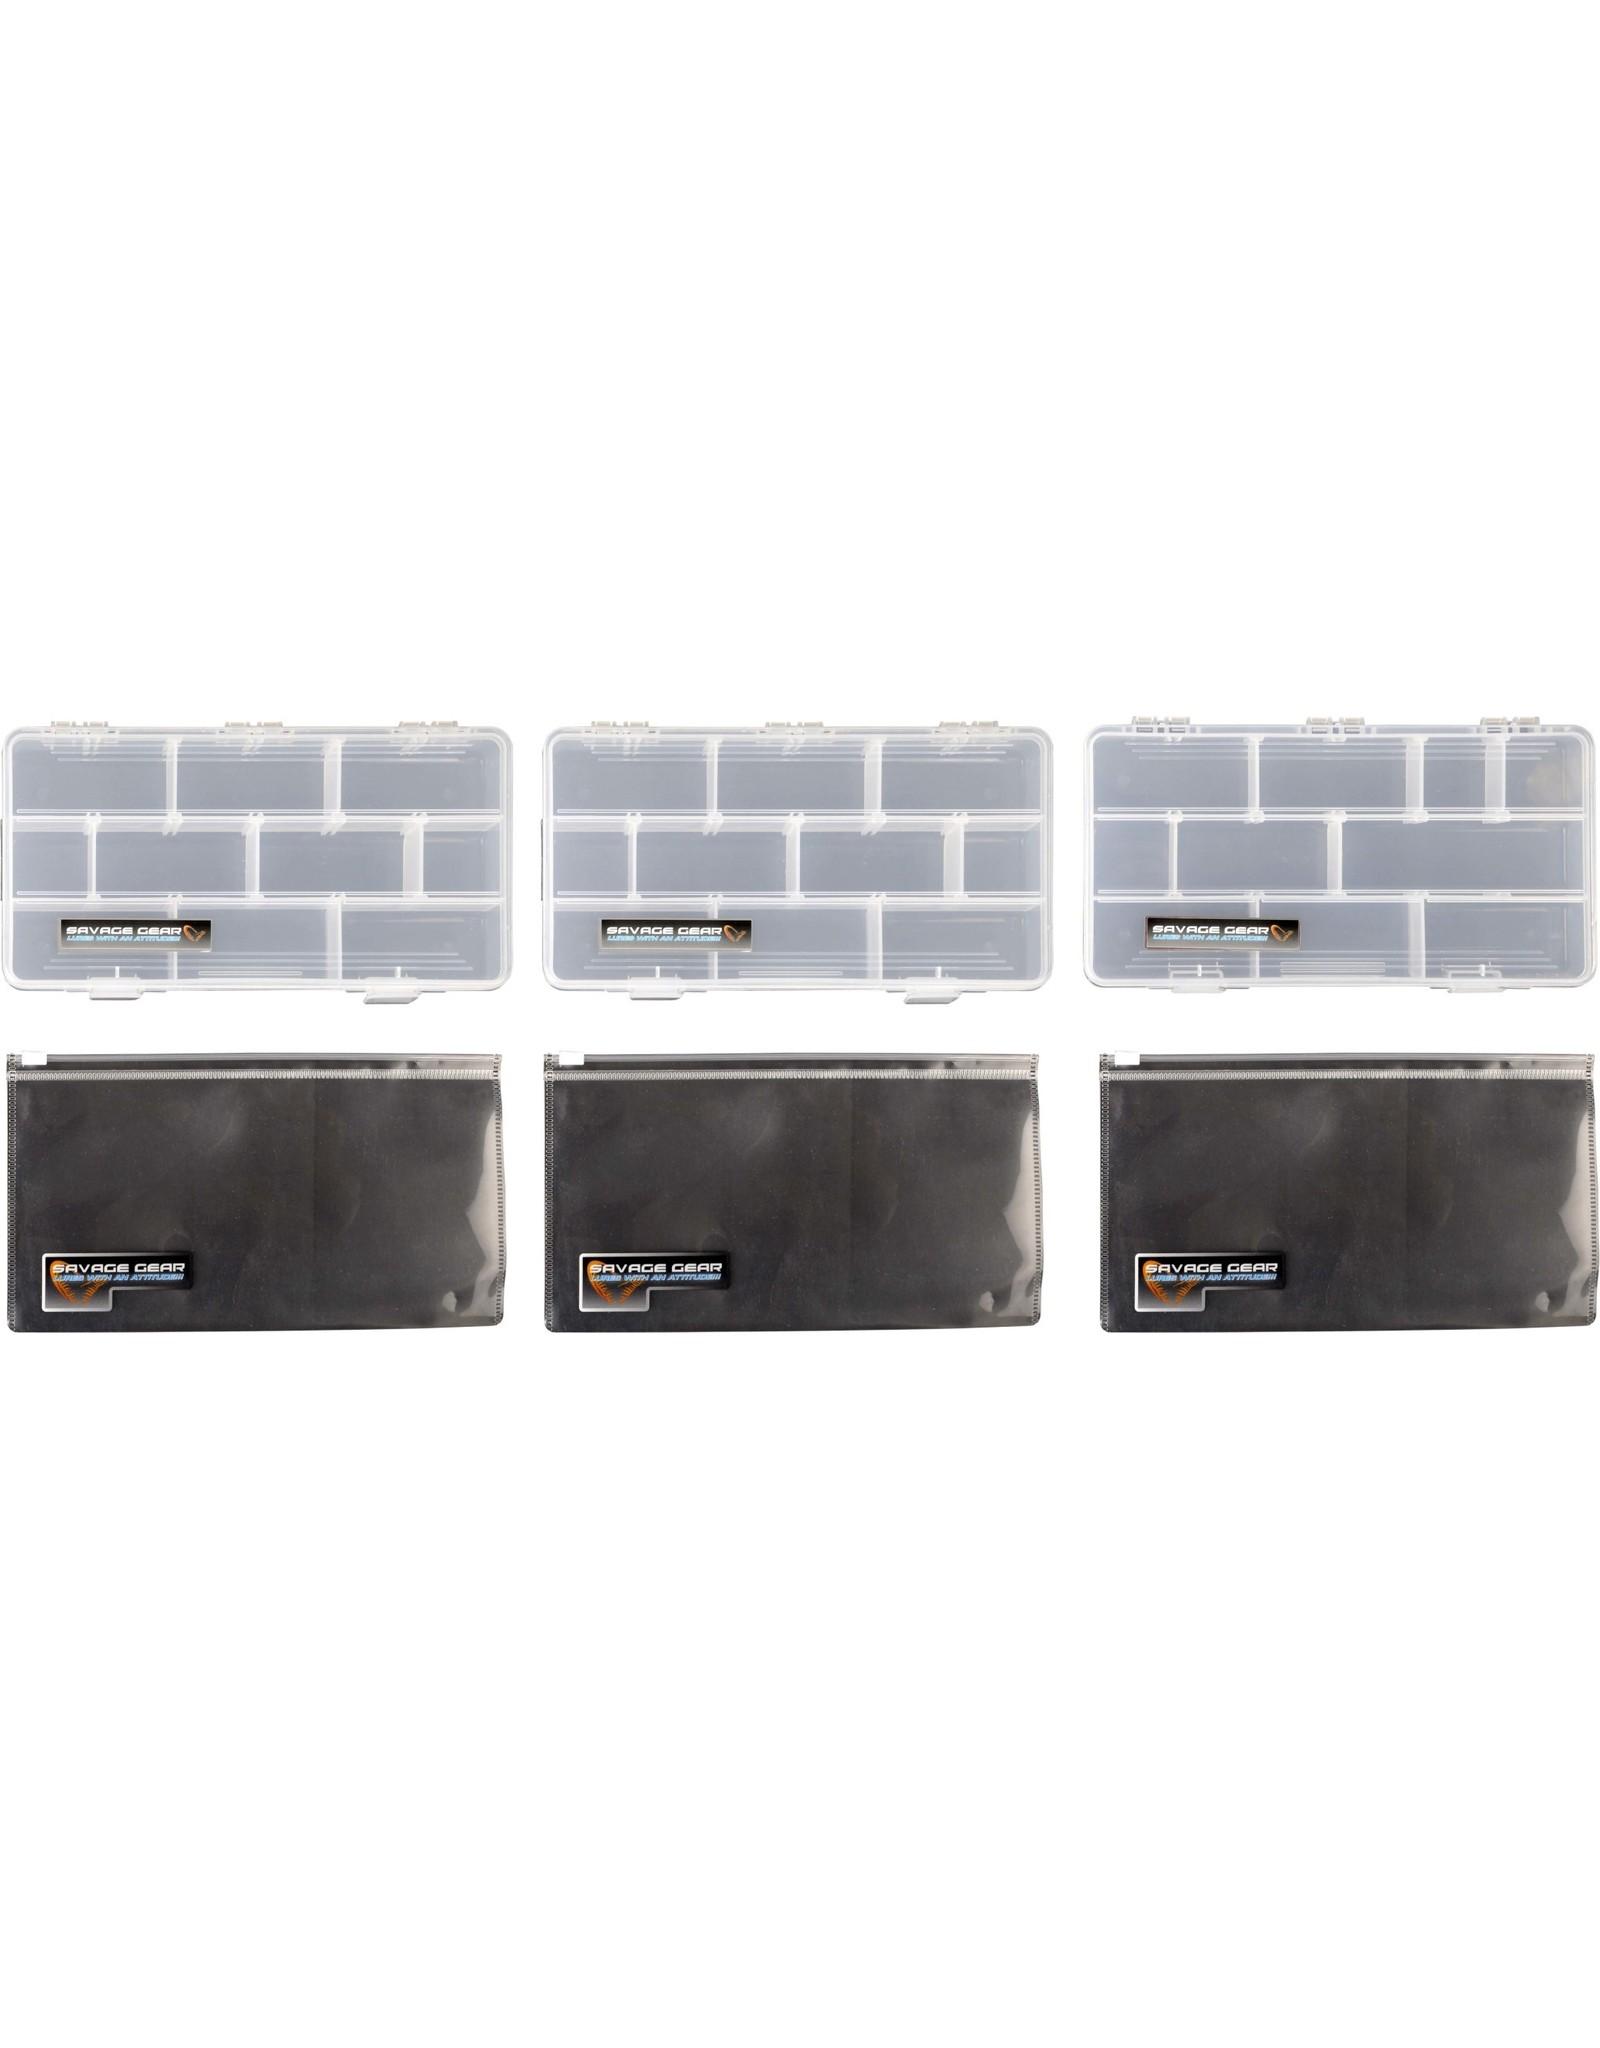 SAVAGE GEAR SYSTEM BOX BAG & PP BAGS BAG 3 BOXES S 5.5L 15X36X23CM